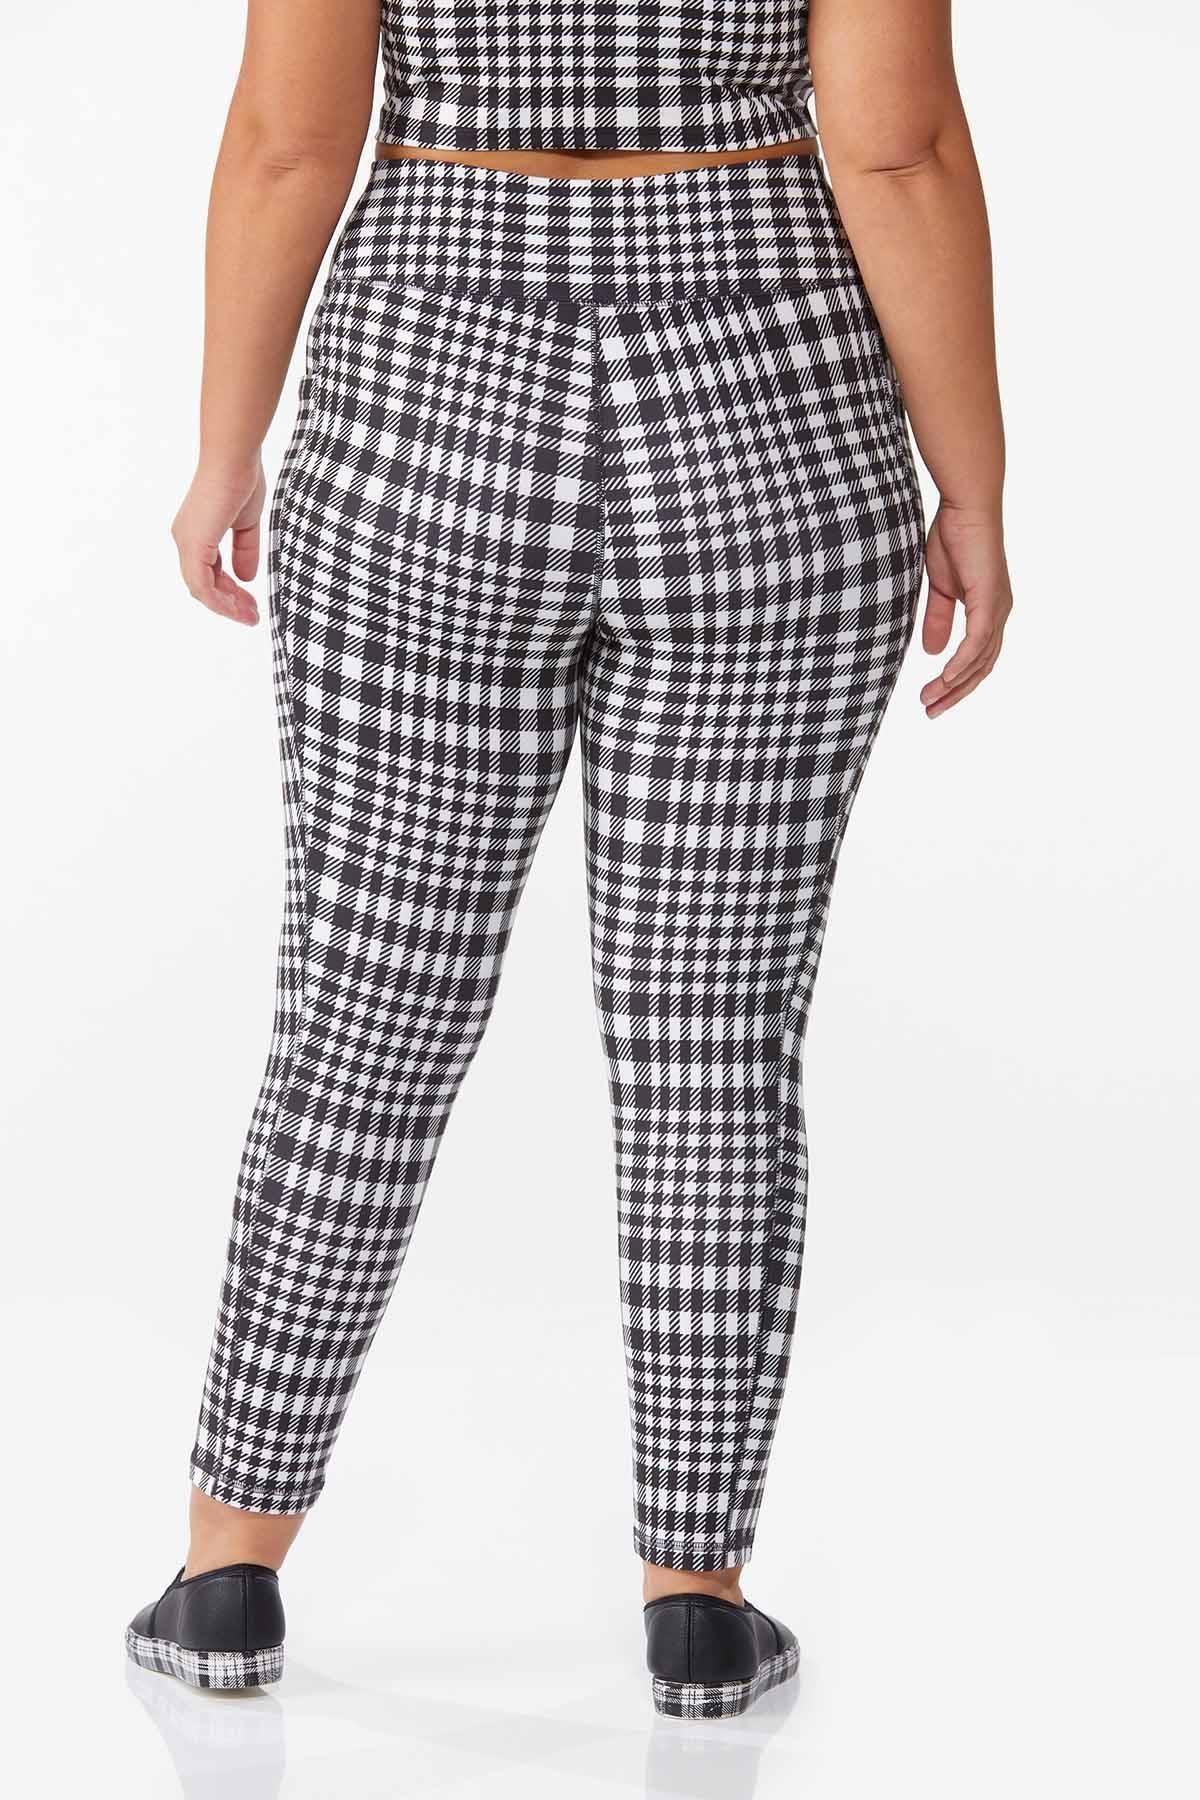 Plus Size Checkered Active Leggings (Item #44668247)